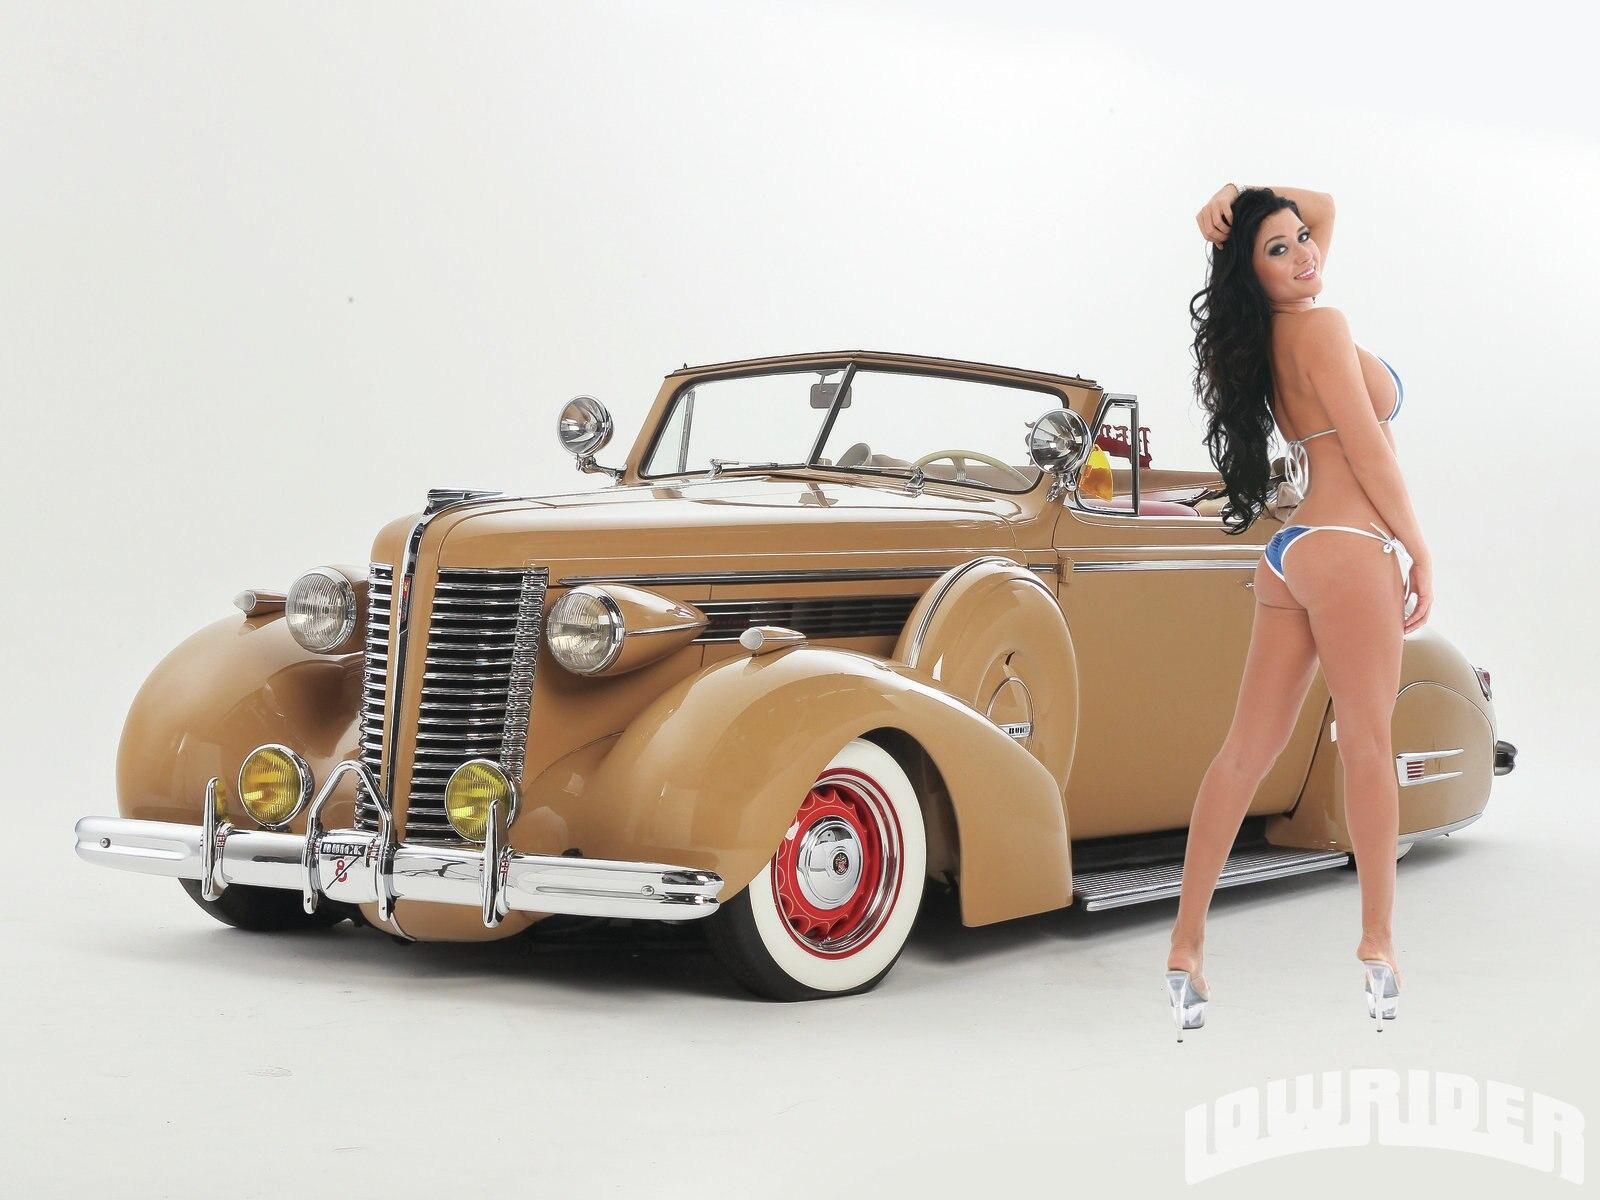 1209-lrmp-01-o-1938-buick-convertible-model